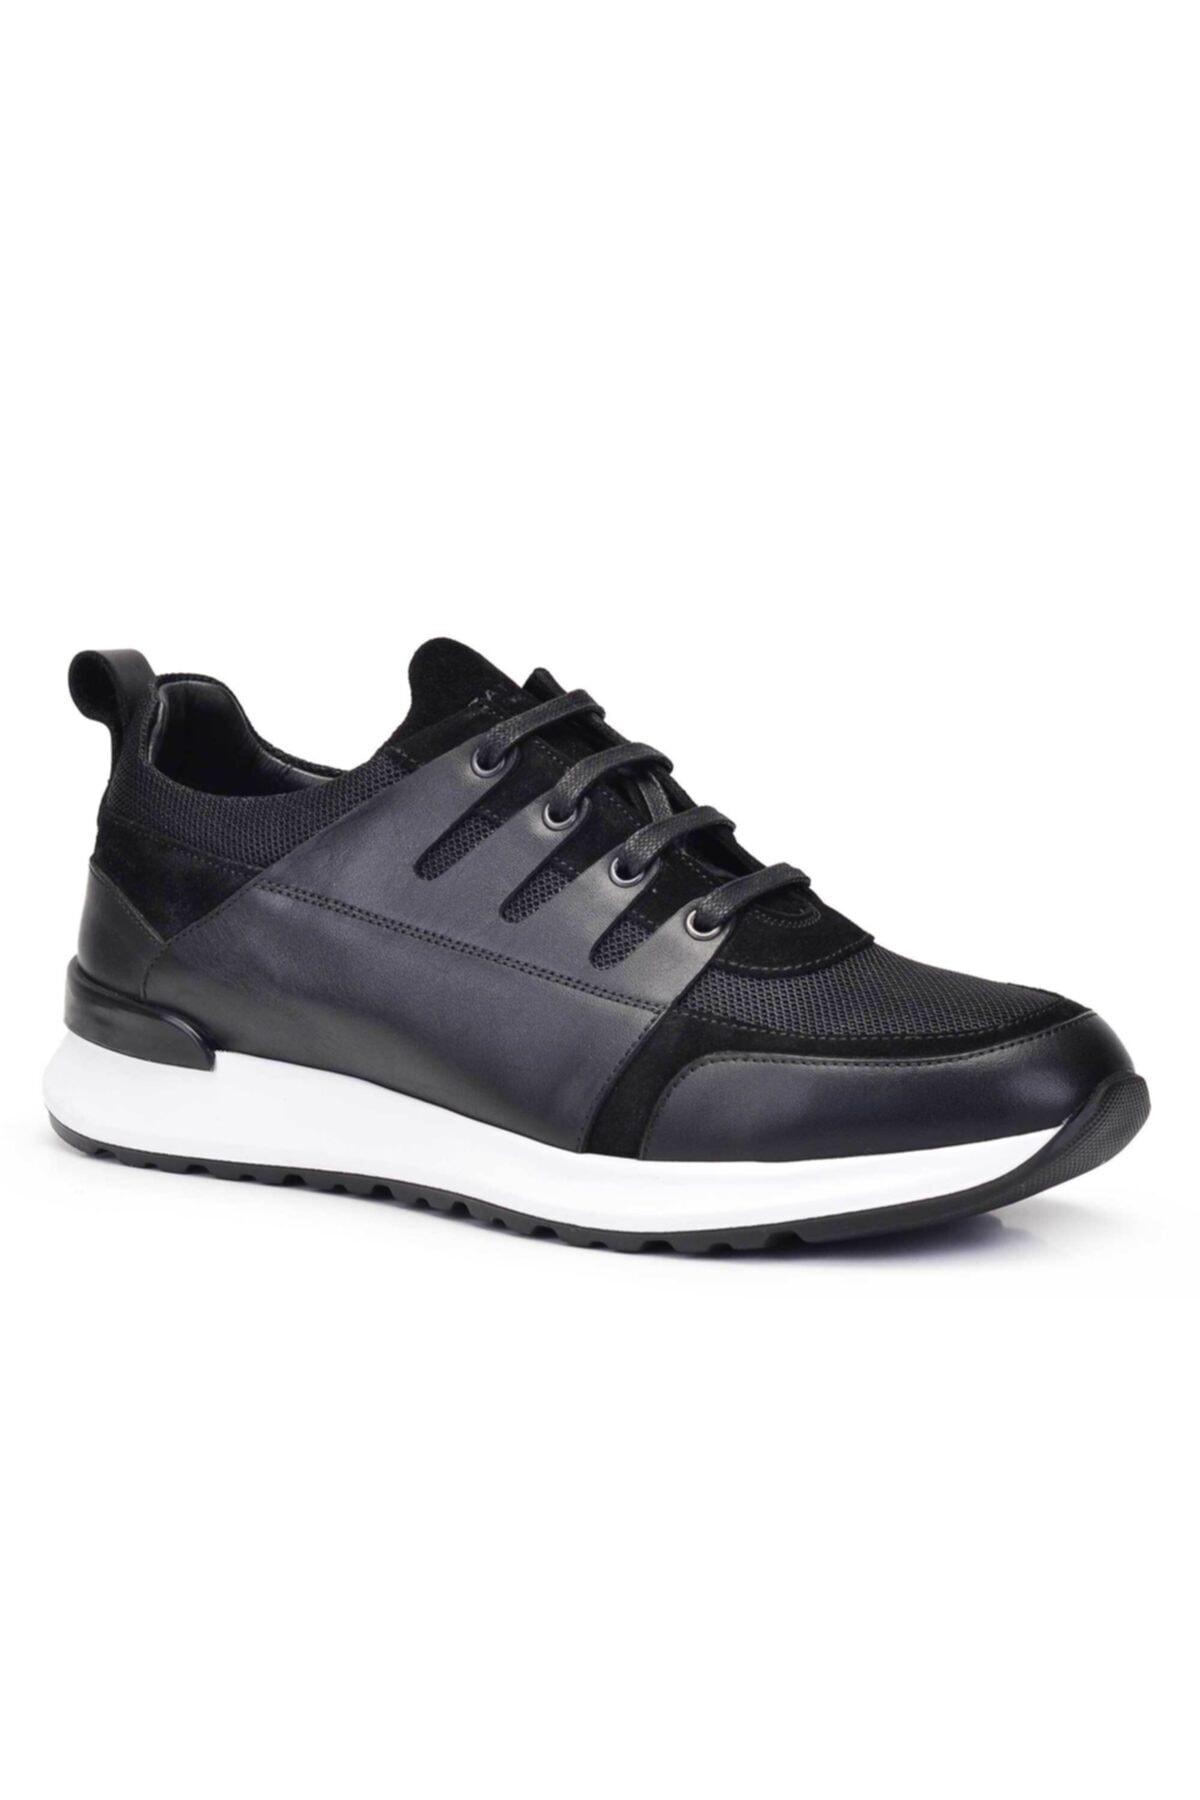 Nevzat Onay Hakiki Deri Siyah Sneaker Erkek Ayakkabı -11783- 2